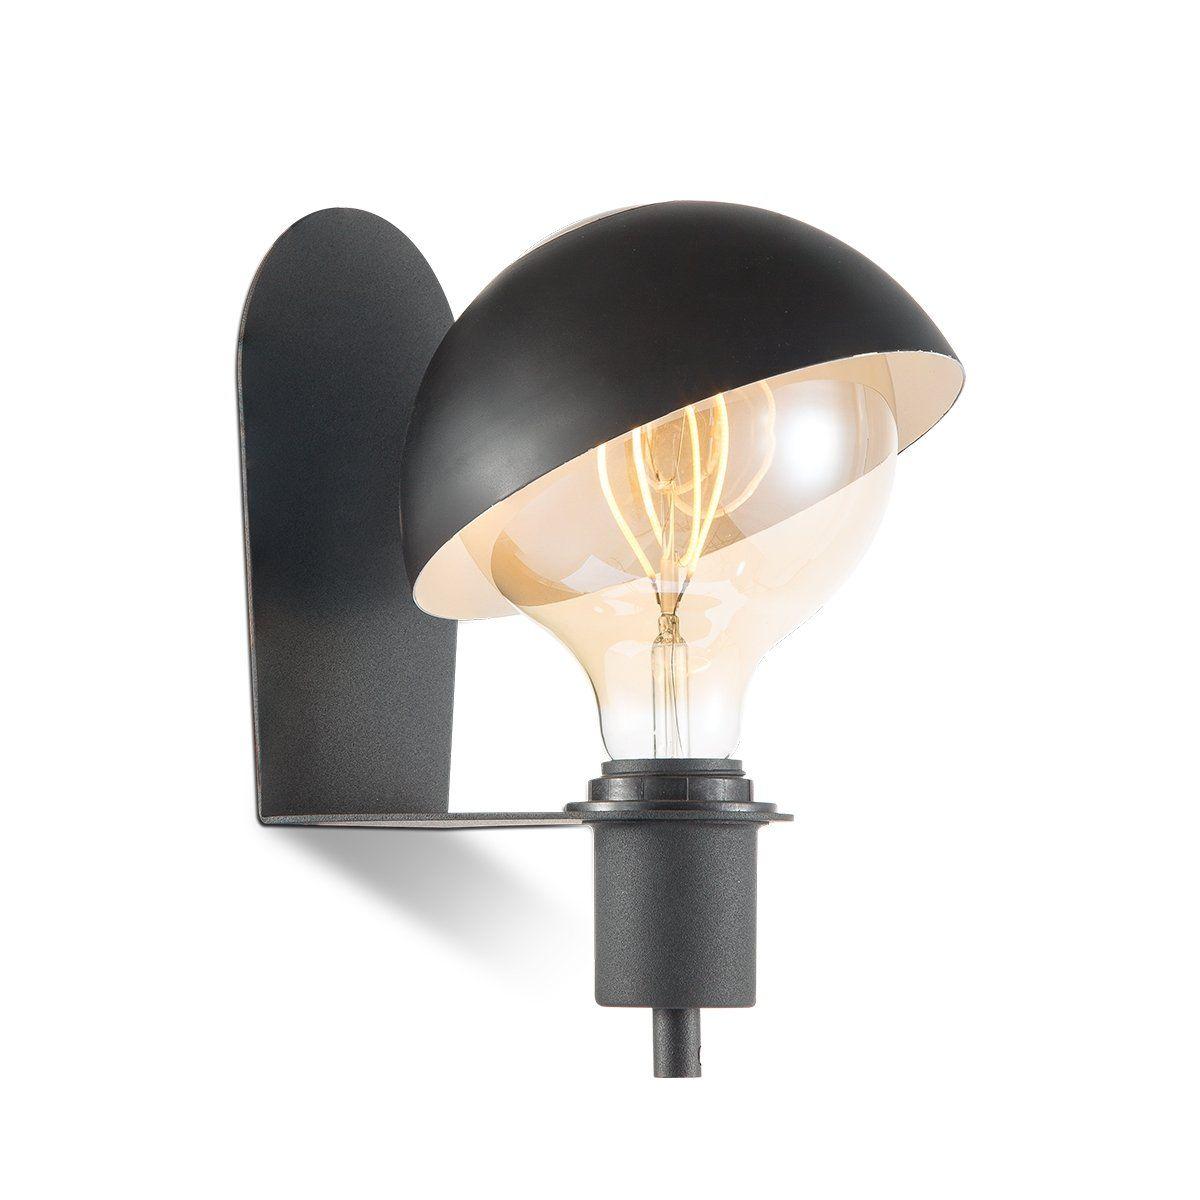 Home sweet home wandlamp Dyna - zwart